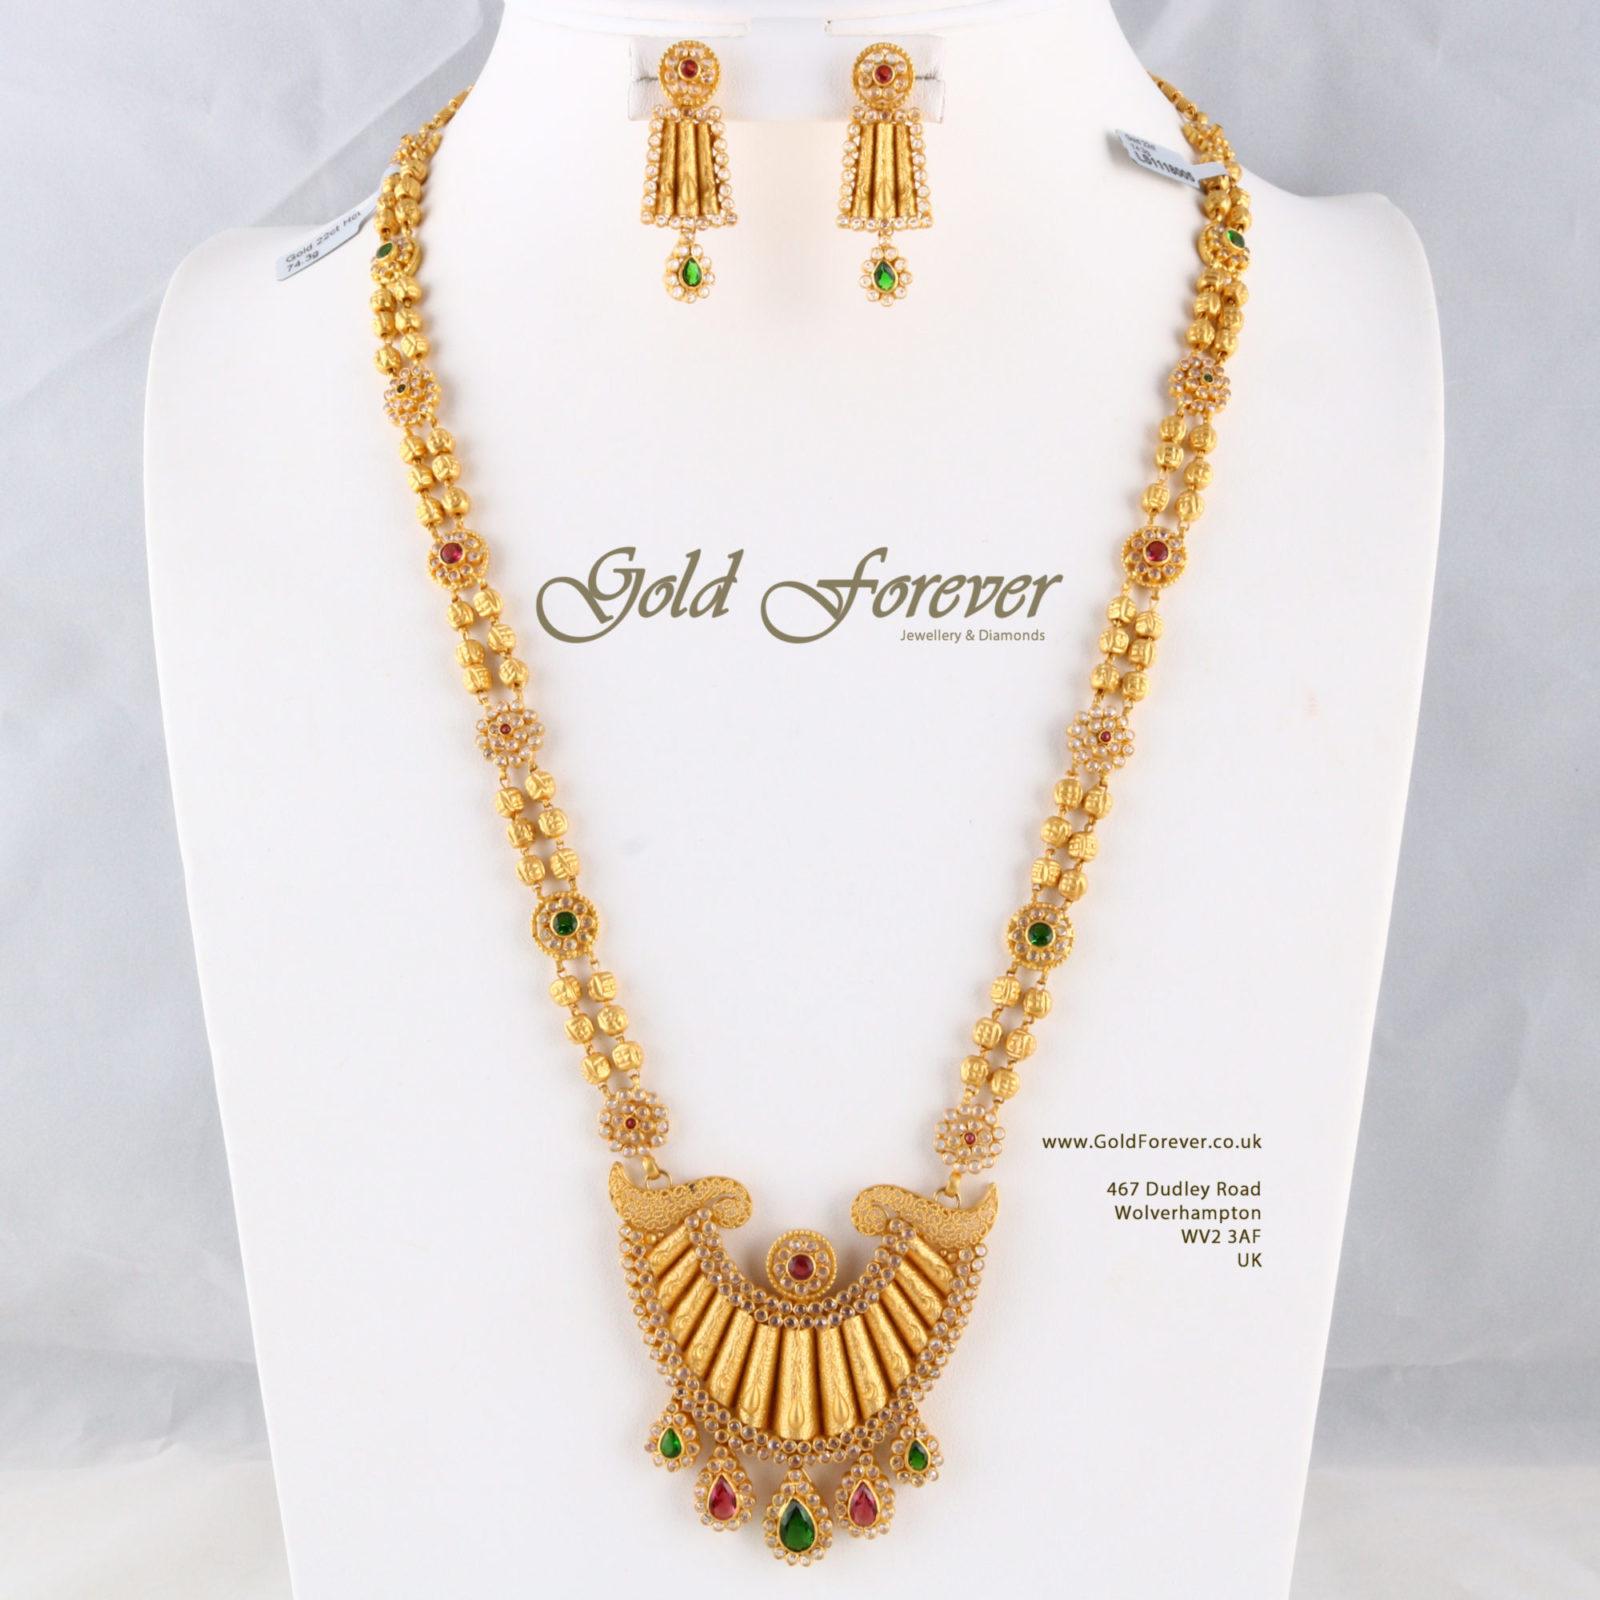 22 Carat Indian Gold Long Necklace 74 3 Grams Code Ls1118005